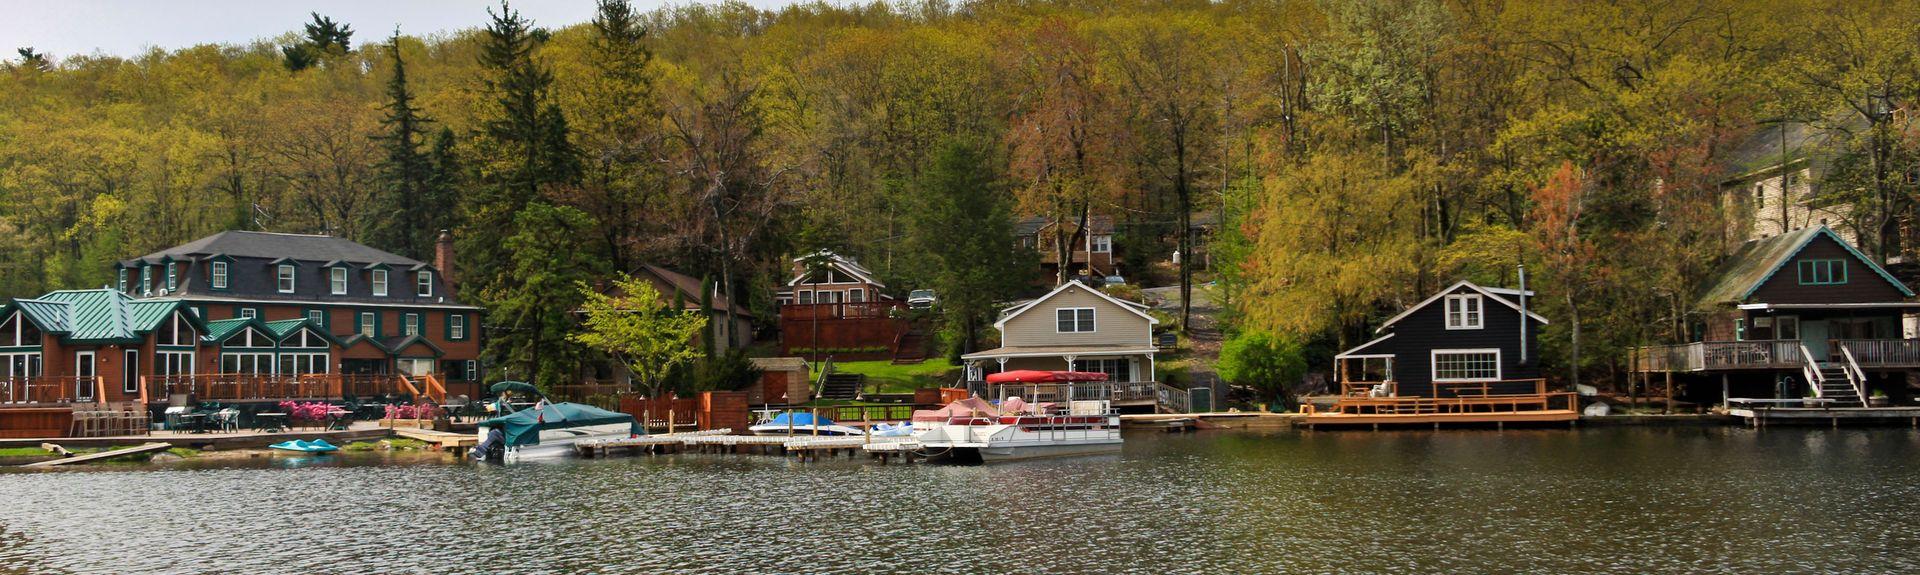 Lake Harmony Pa Vacation Rentals House Rentals More Vrbo